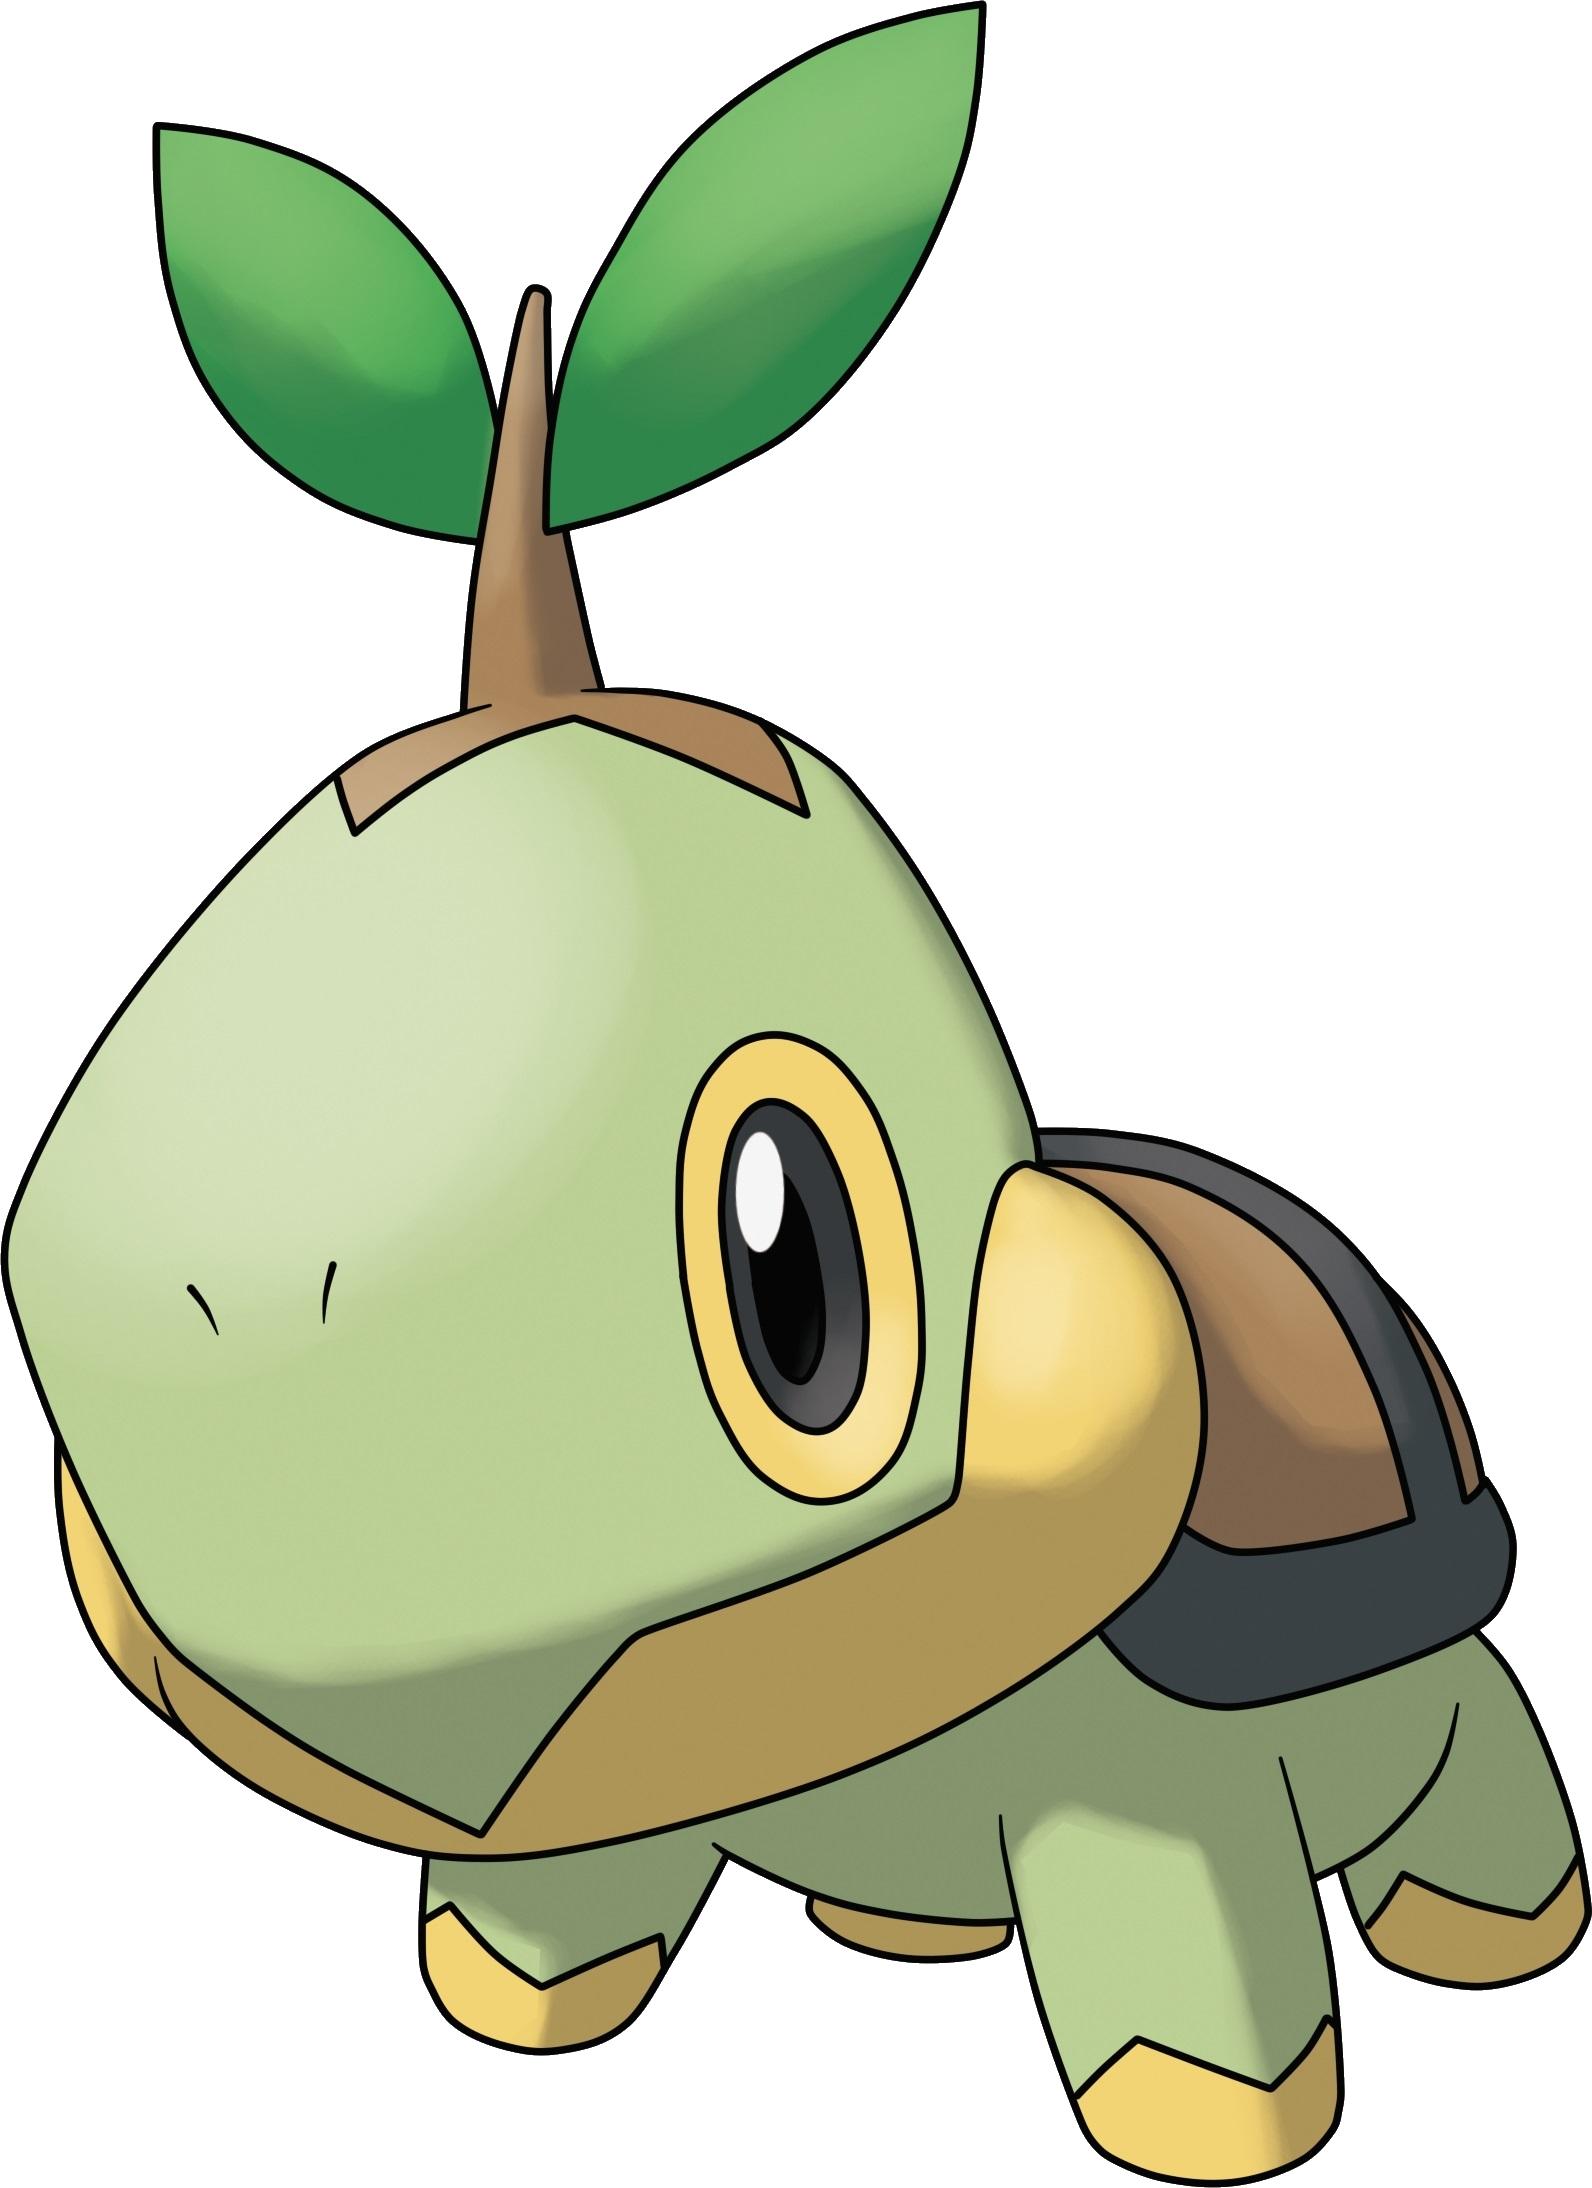 Pokemon And Y Cartoon Characters : Image turtwig pokemon ranger shadows of almia